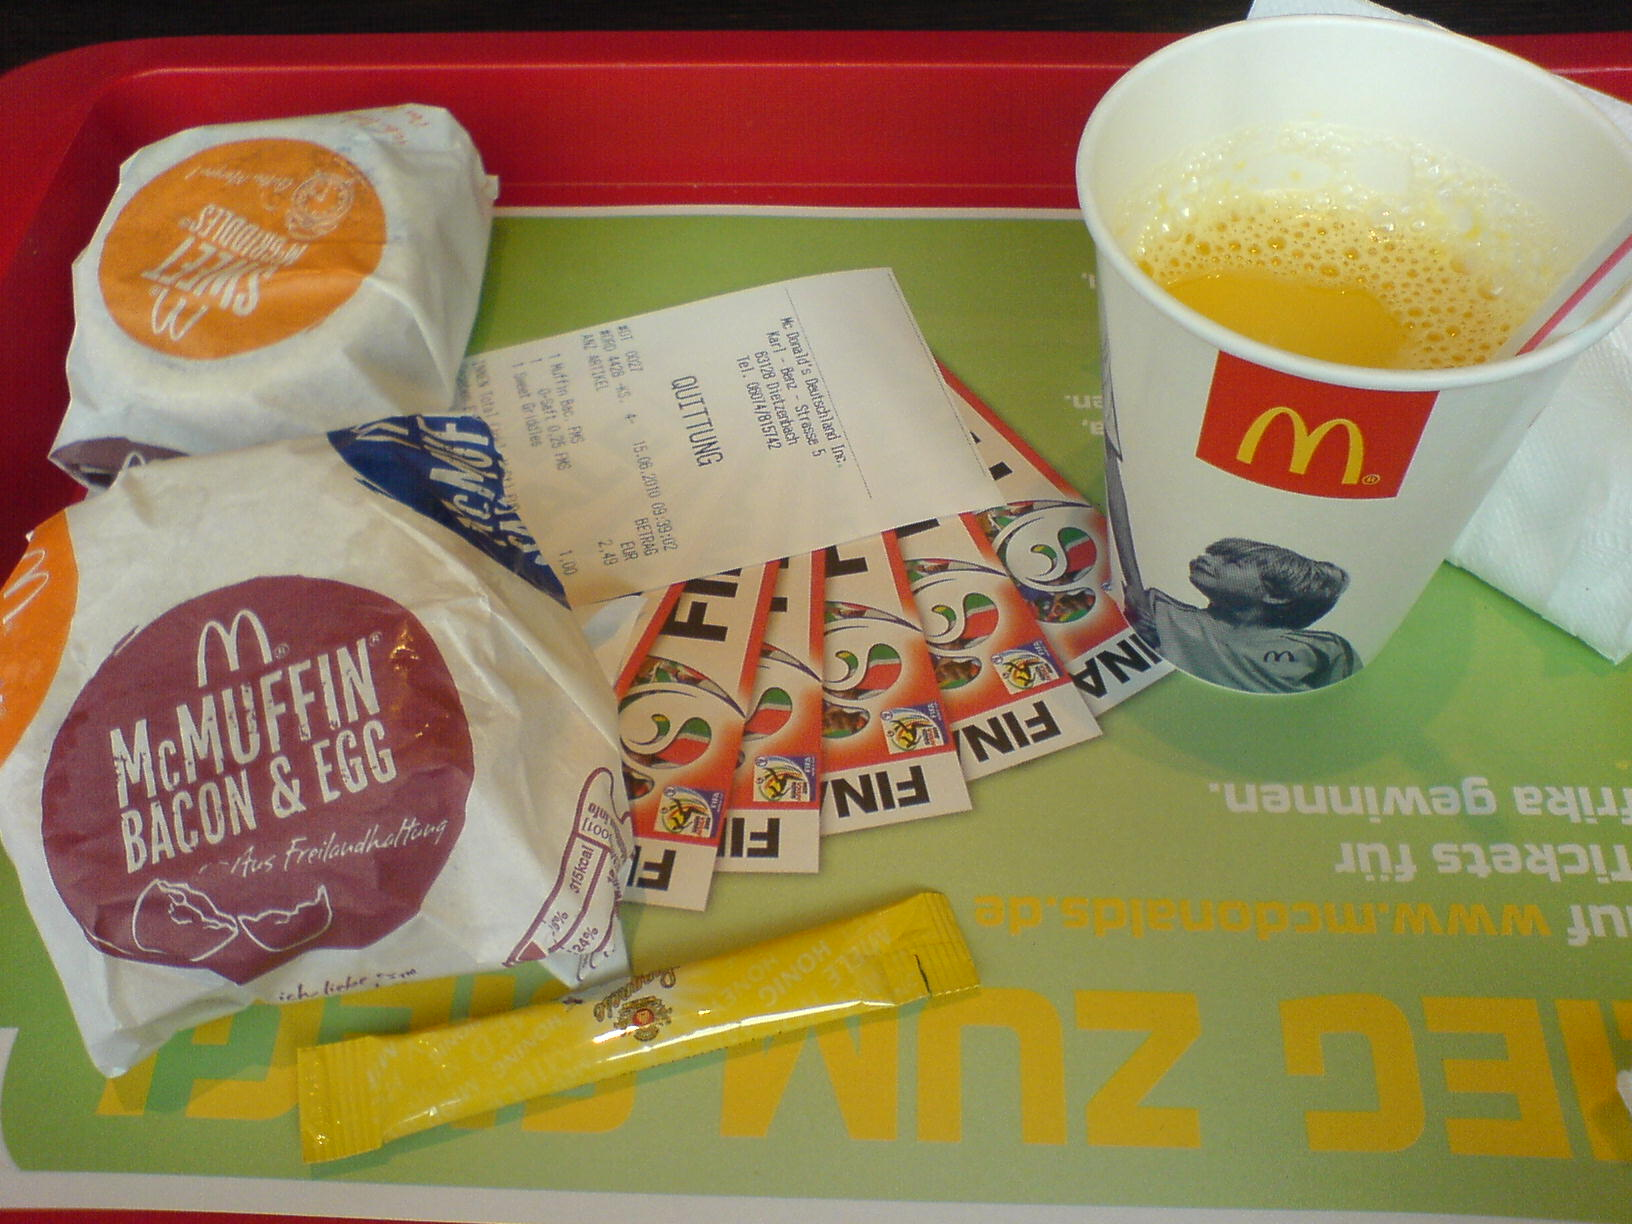 http://foodloader.net/Holz_2010-06-15_McDonalds_Fruehstueck.jpg